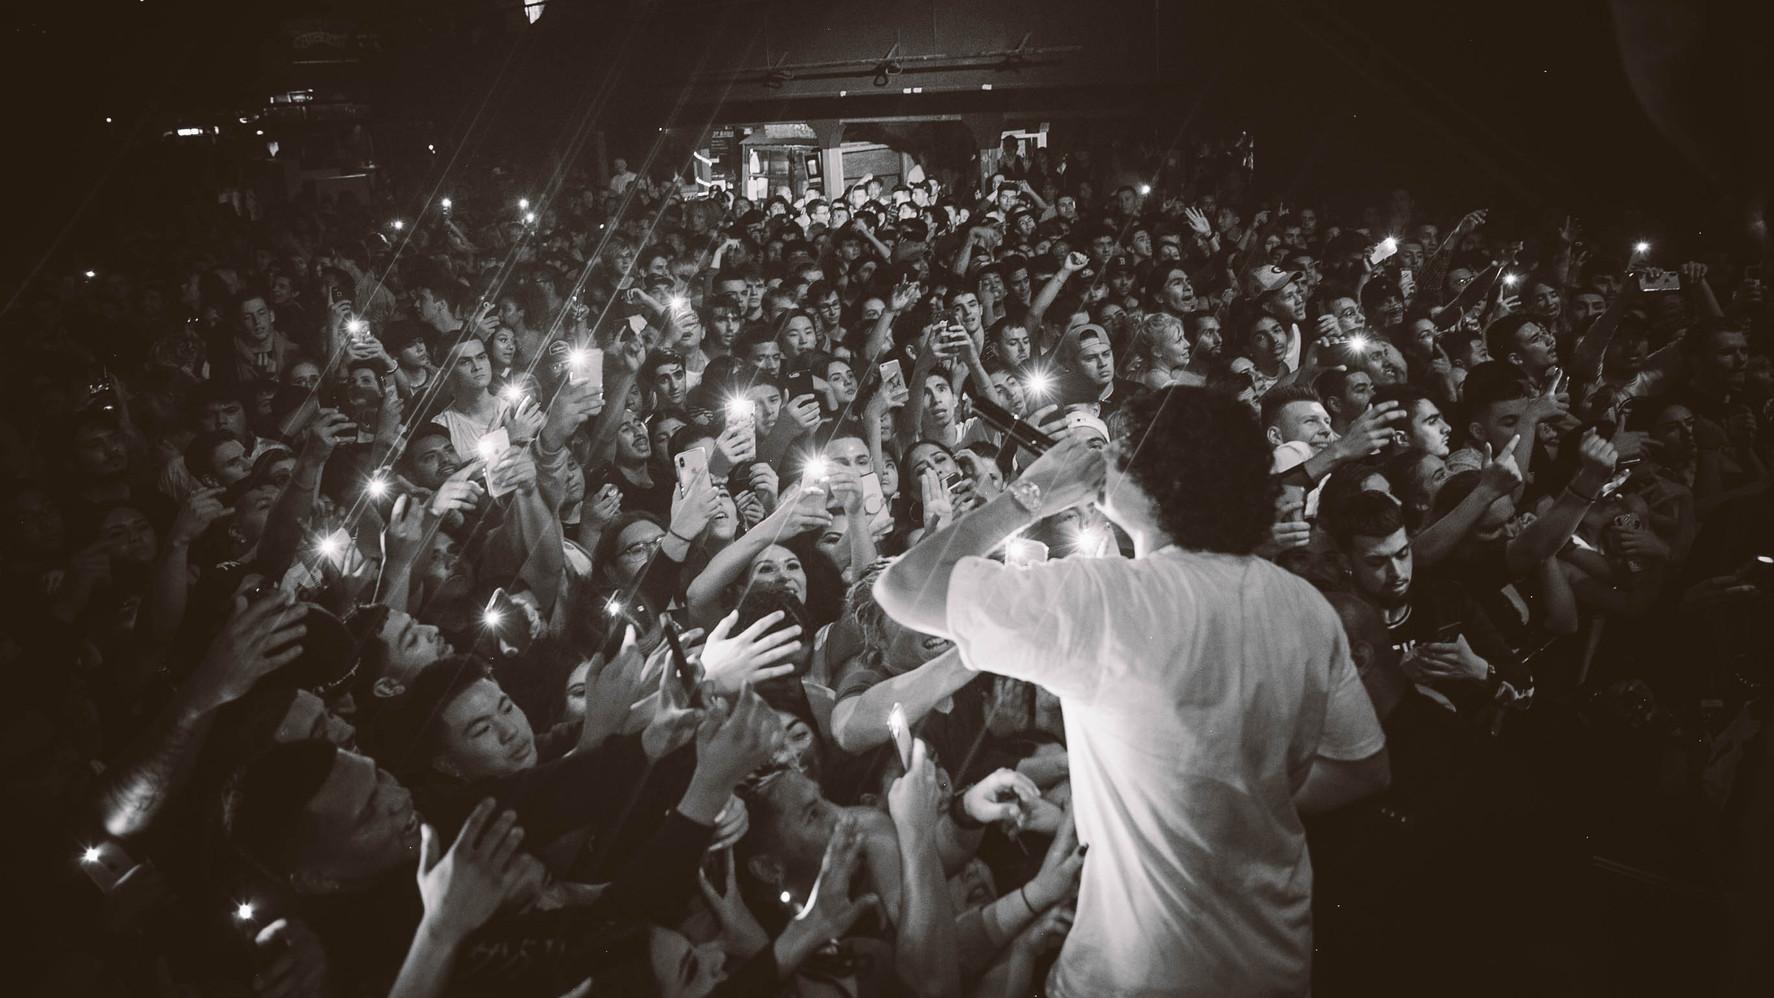 10.30.19 | Shoreline Mafia | AzChike | Catalyst Club, Santa Cruz, CA | Photographer: Matt Pang